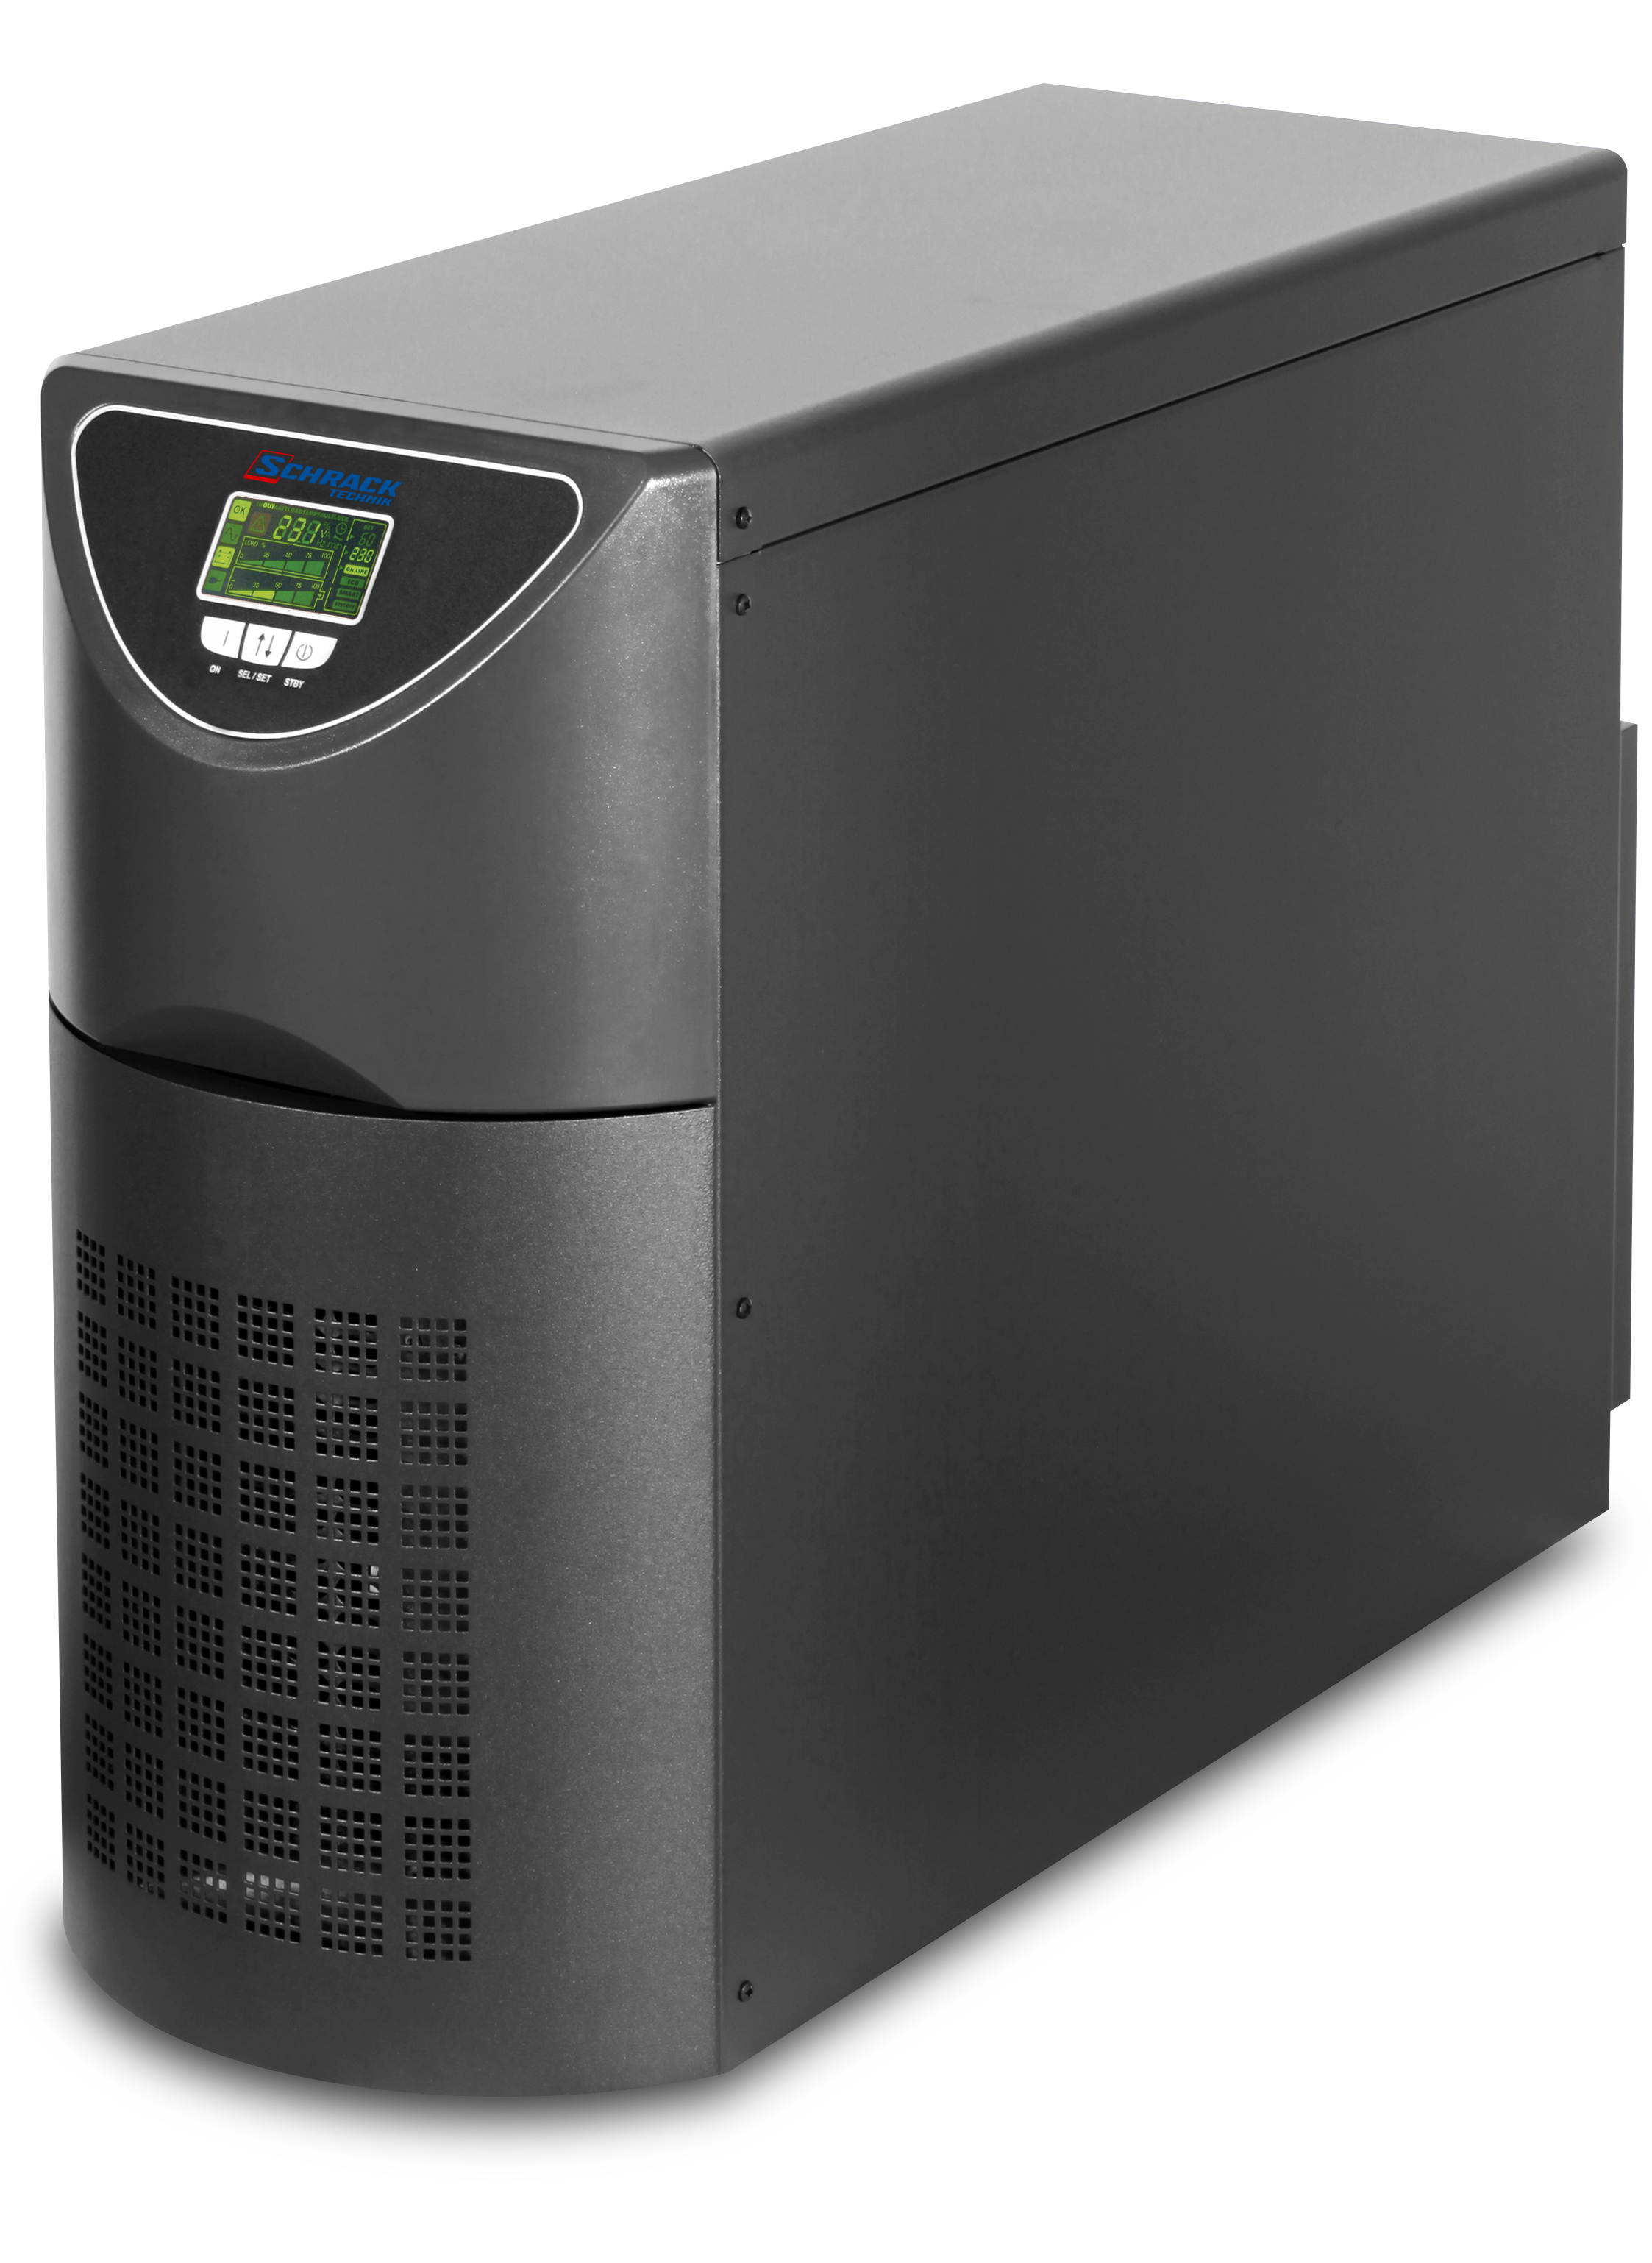 1 Stk USV GENIO Maxi 8kVA 6,4kW 8Min.3ph/1ph, 1ph/1ph/ Online USPW800---